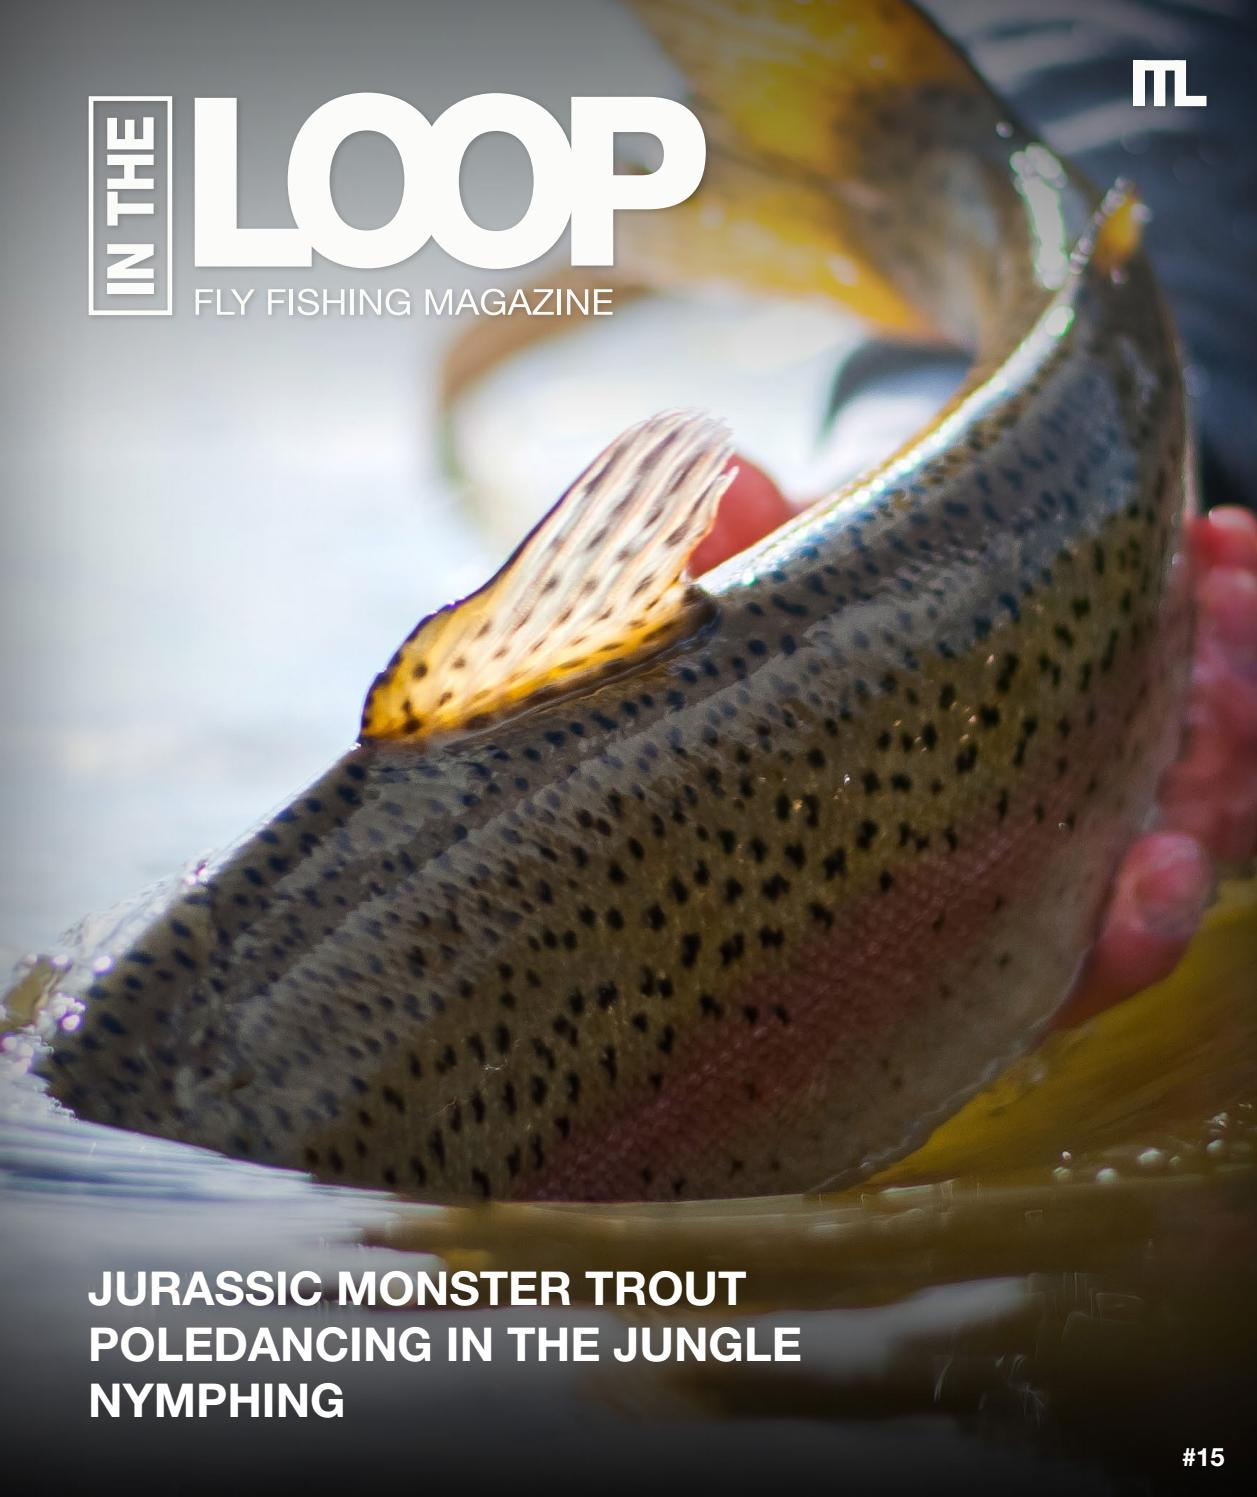 x 6 Steelhead, Salmon, Trout, Bonefish Fly Fishing Flies Steelhead Sunset